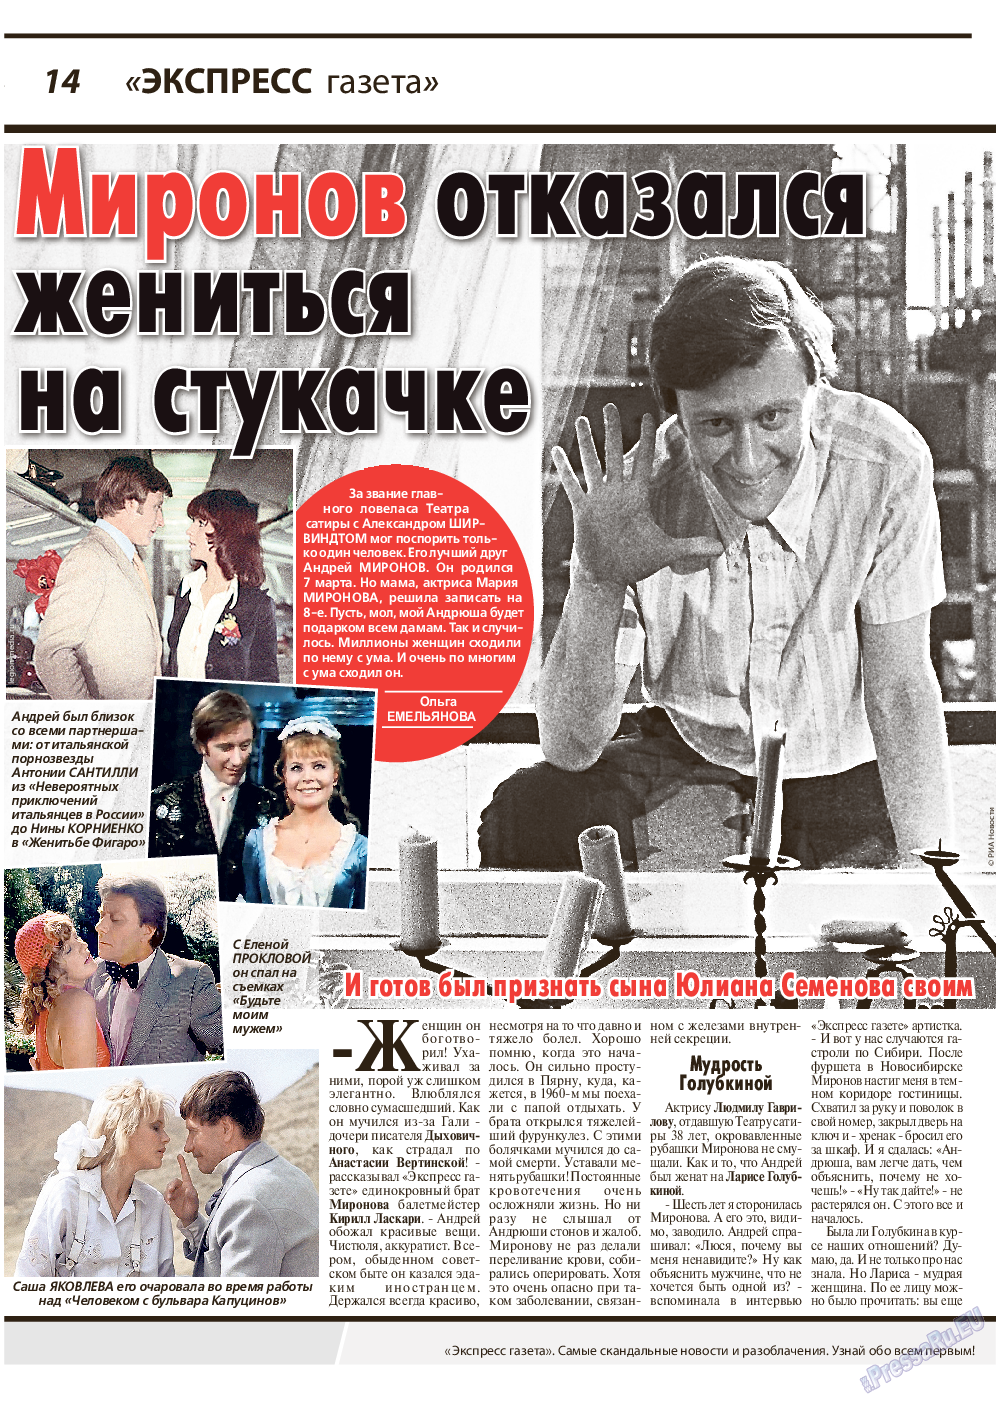 Экспресс газета (газета). 2019 год, номер 9, стр. 14